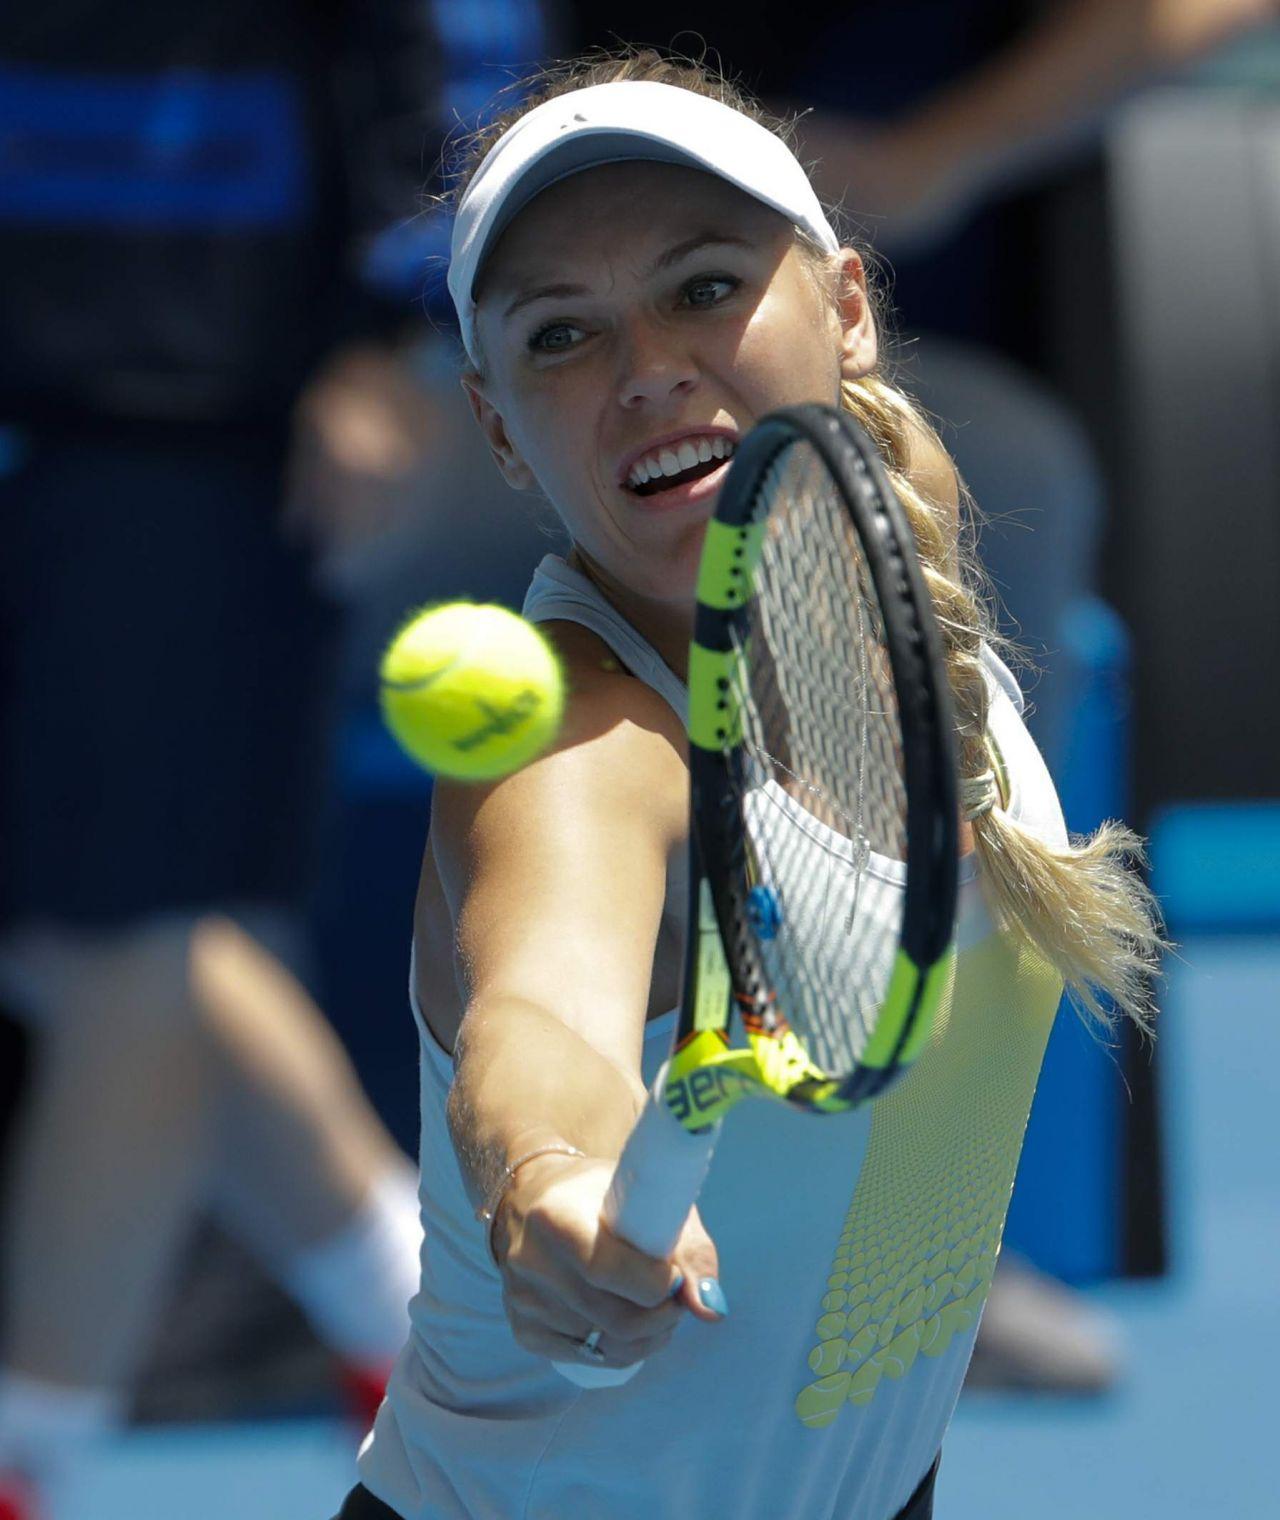 Caroline Wozniacki Practice Session At The Australian Open